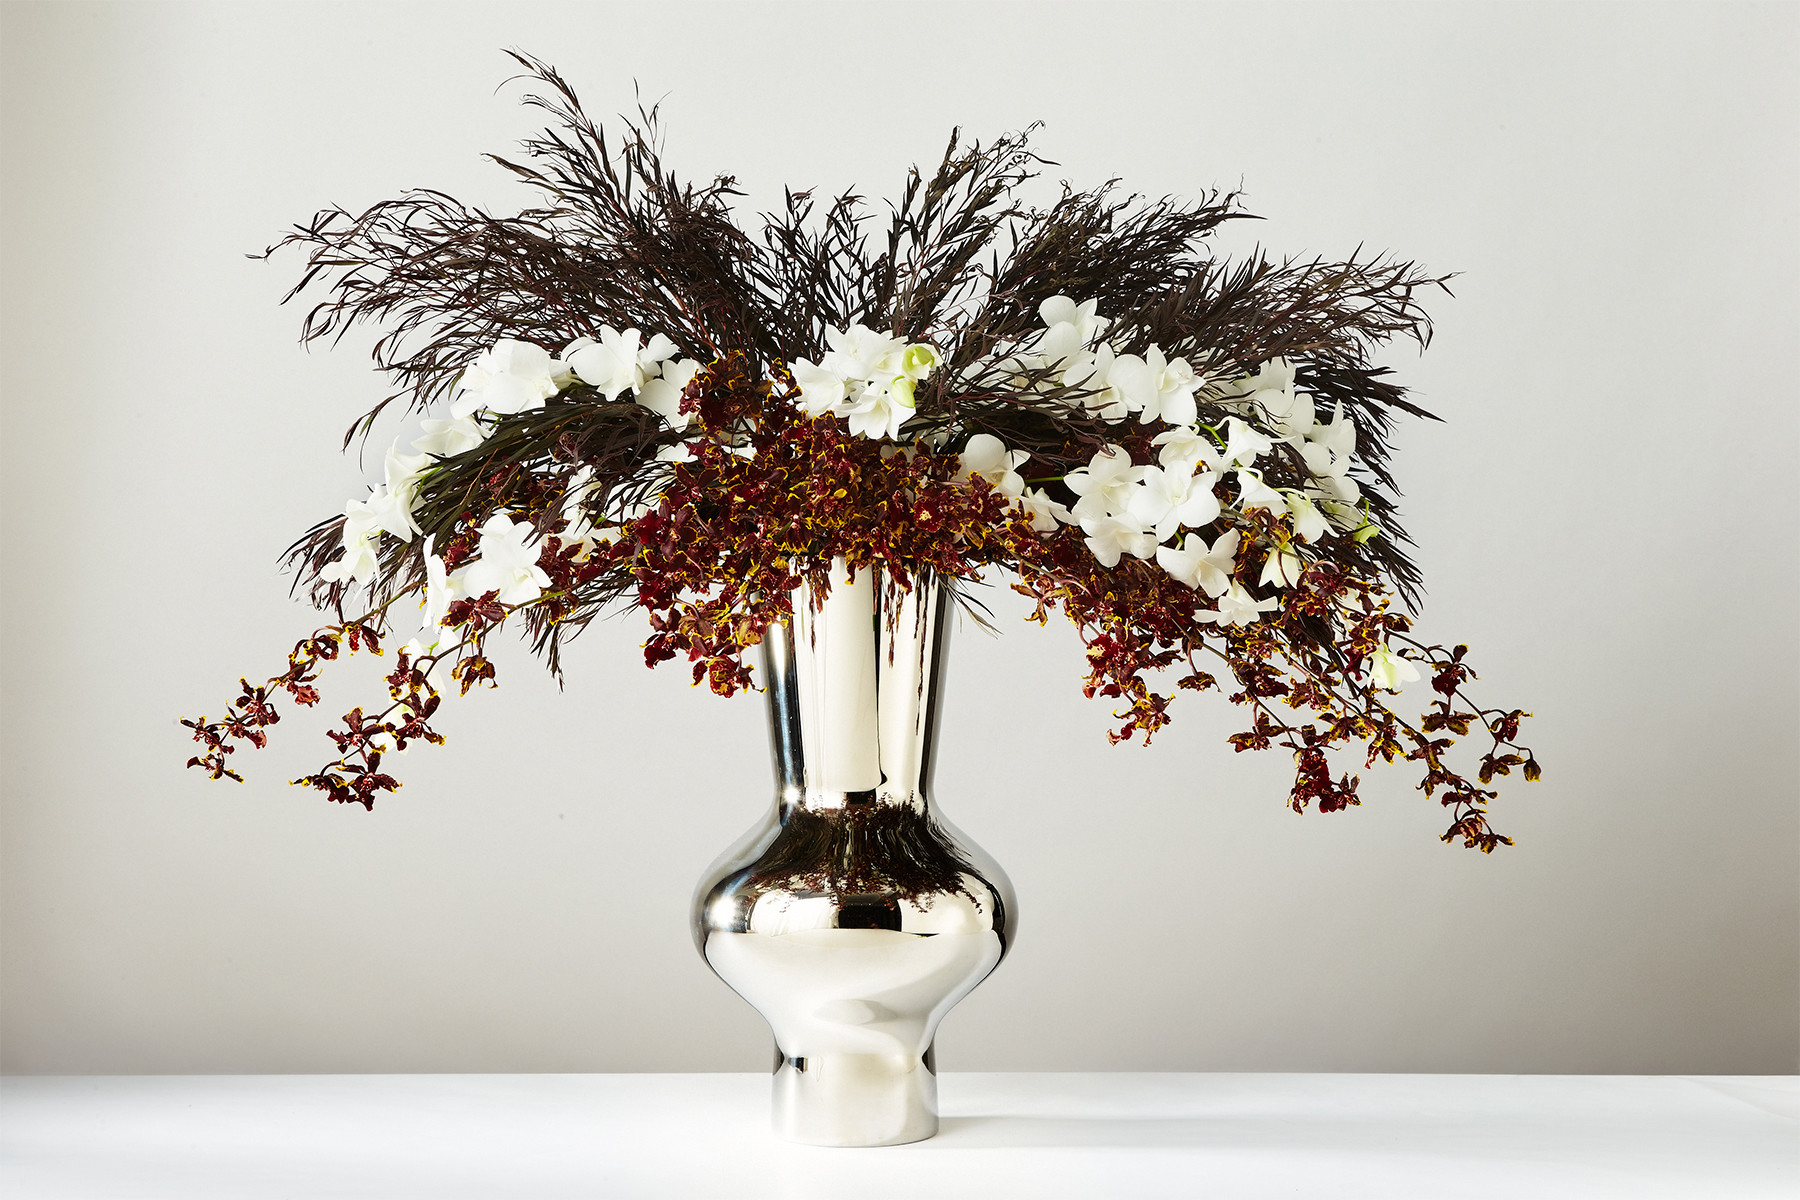 21 Lovable George Jensen Vase 2021 free download george jensen vase of meta flora georg jensen photos wwd intended for thealfredo vase 1818